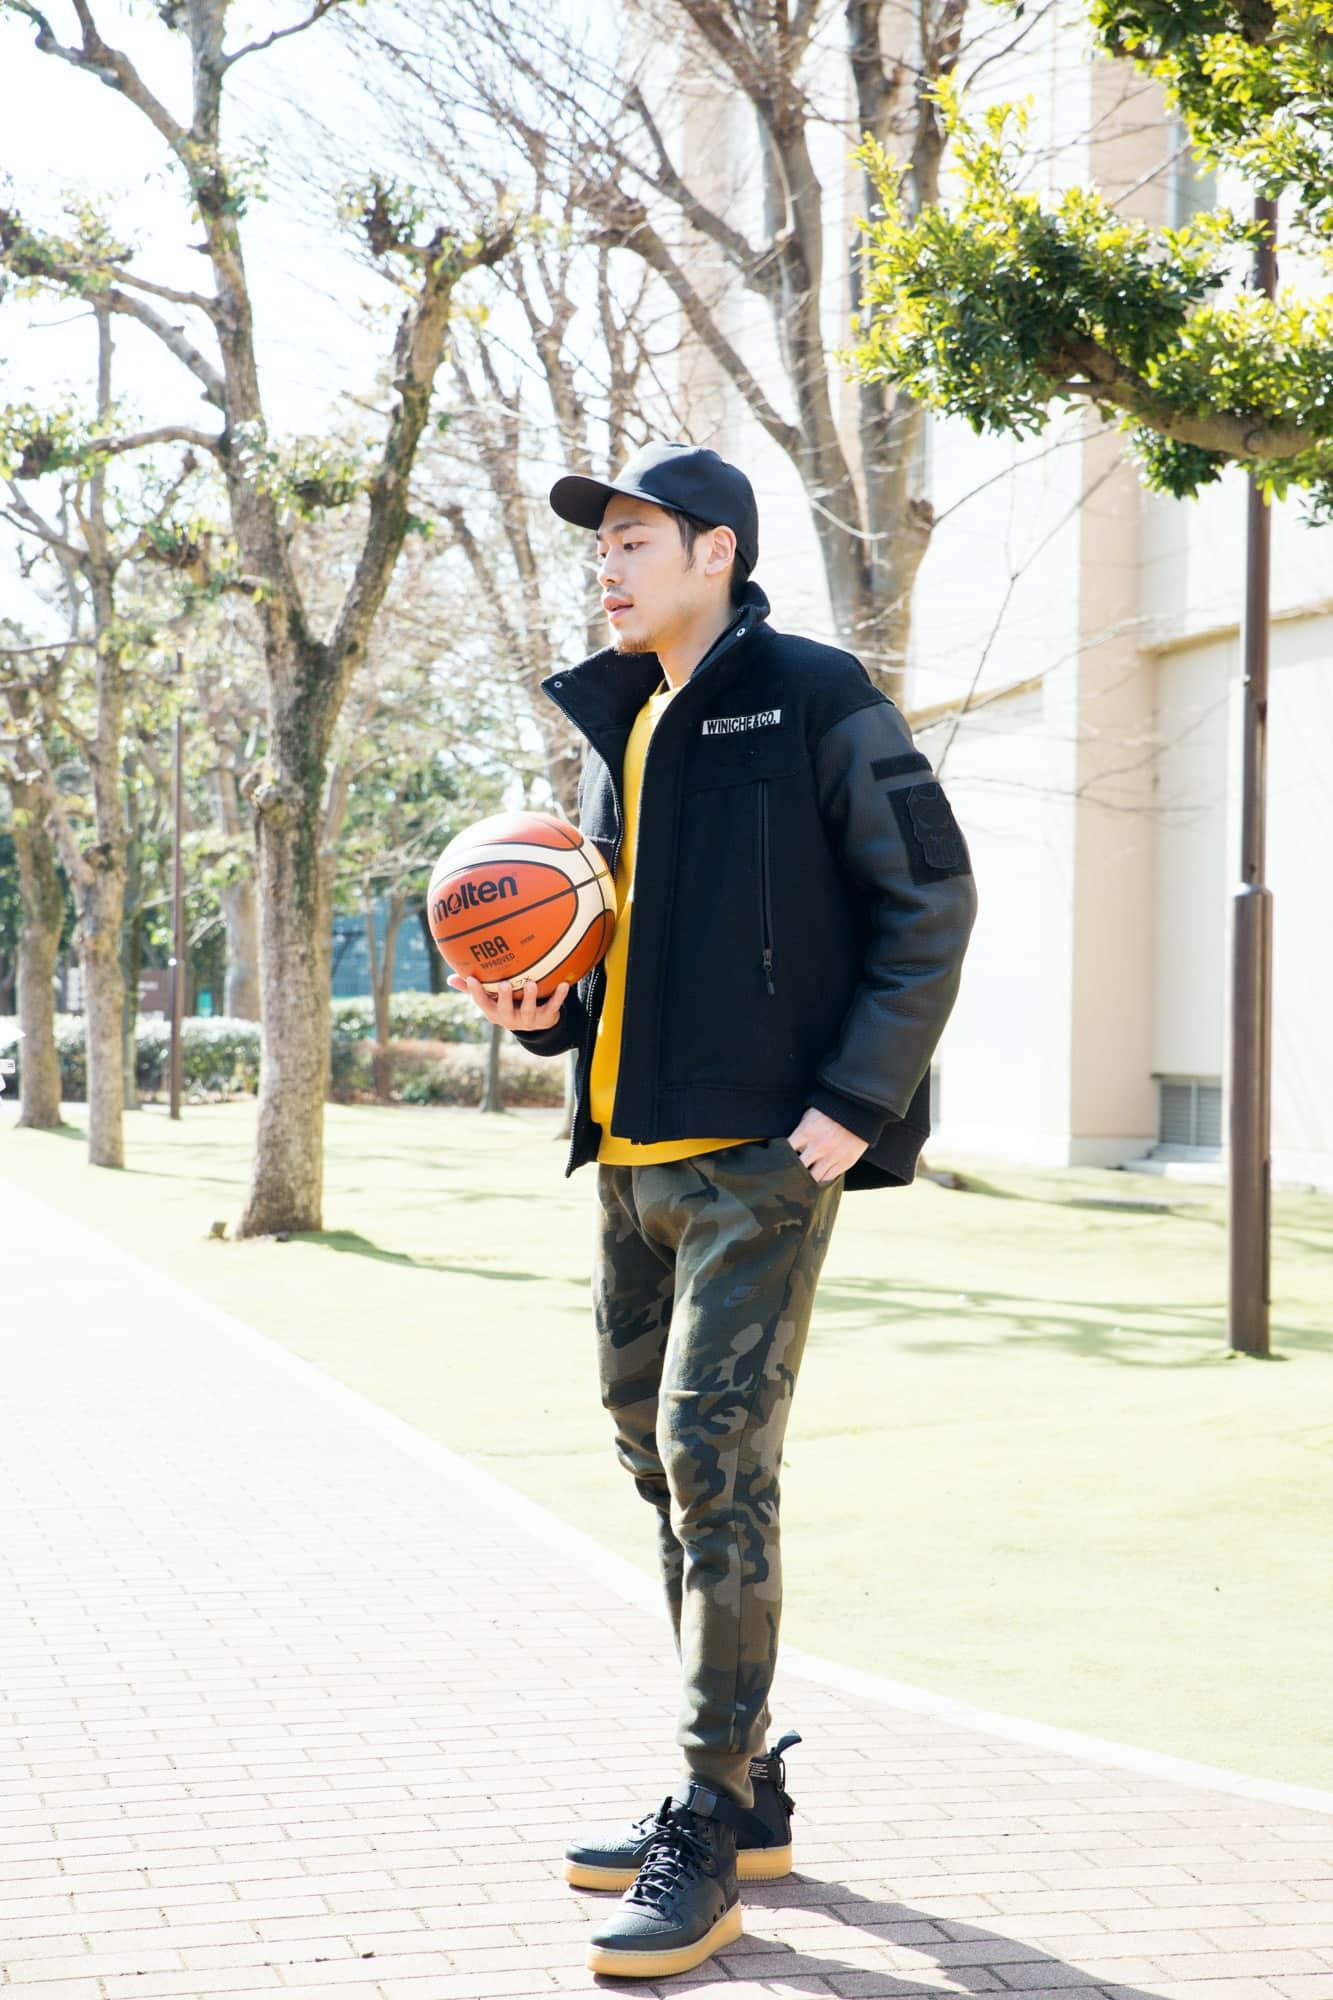 <Bリーグ×ファションの密な関係 Vol.1>サンロッカーズ渋谷:長谷川智也選手のeasyスタイル